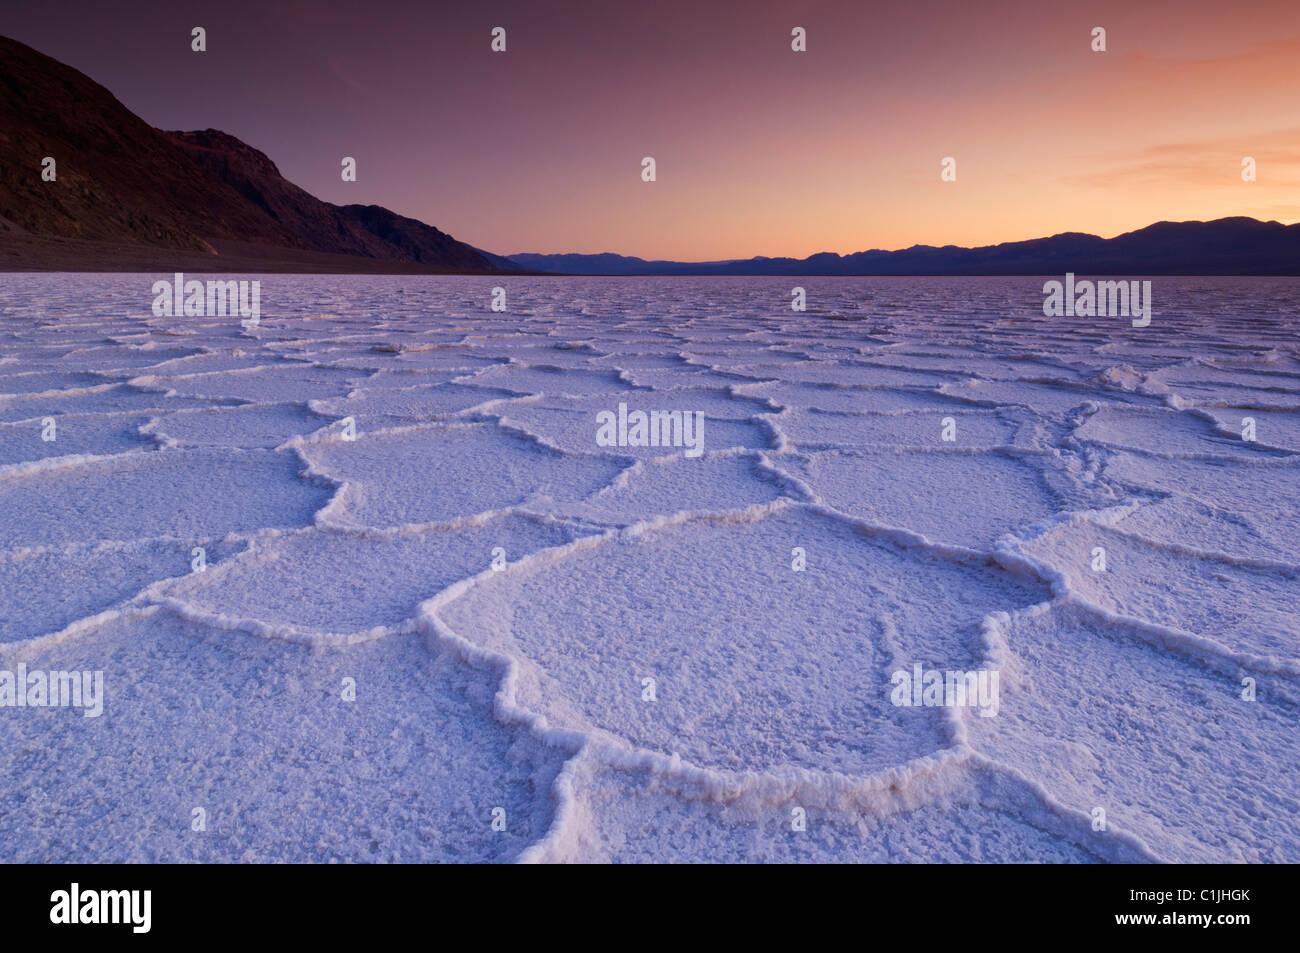 Salt pan polygons at sunset Badwater Basin Death Valley National Park, California, USA - Stock Image